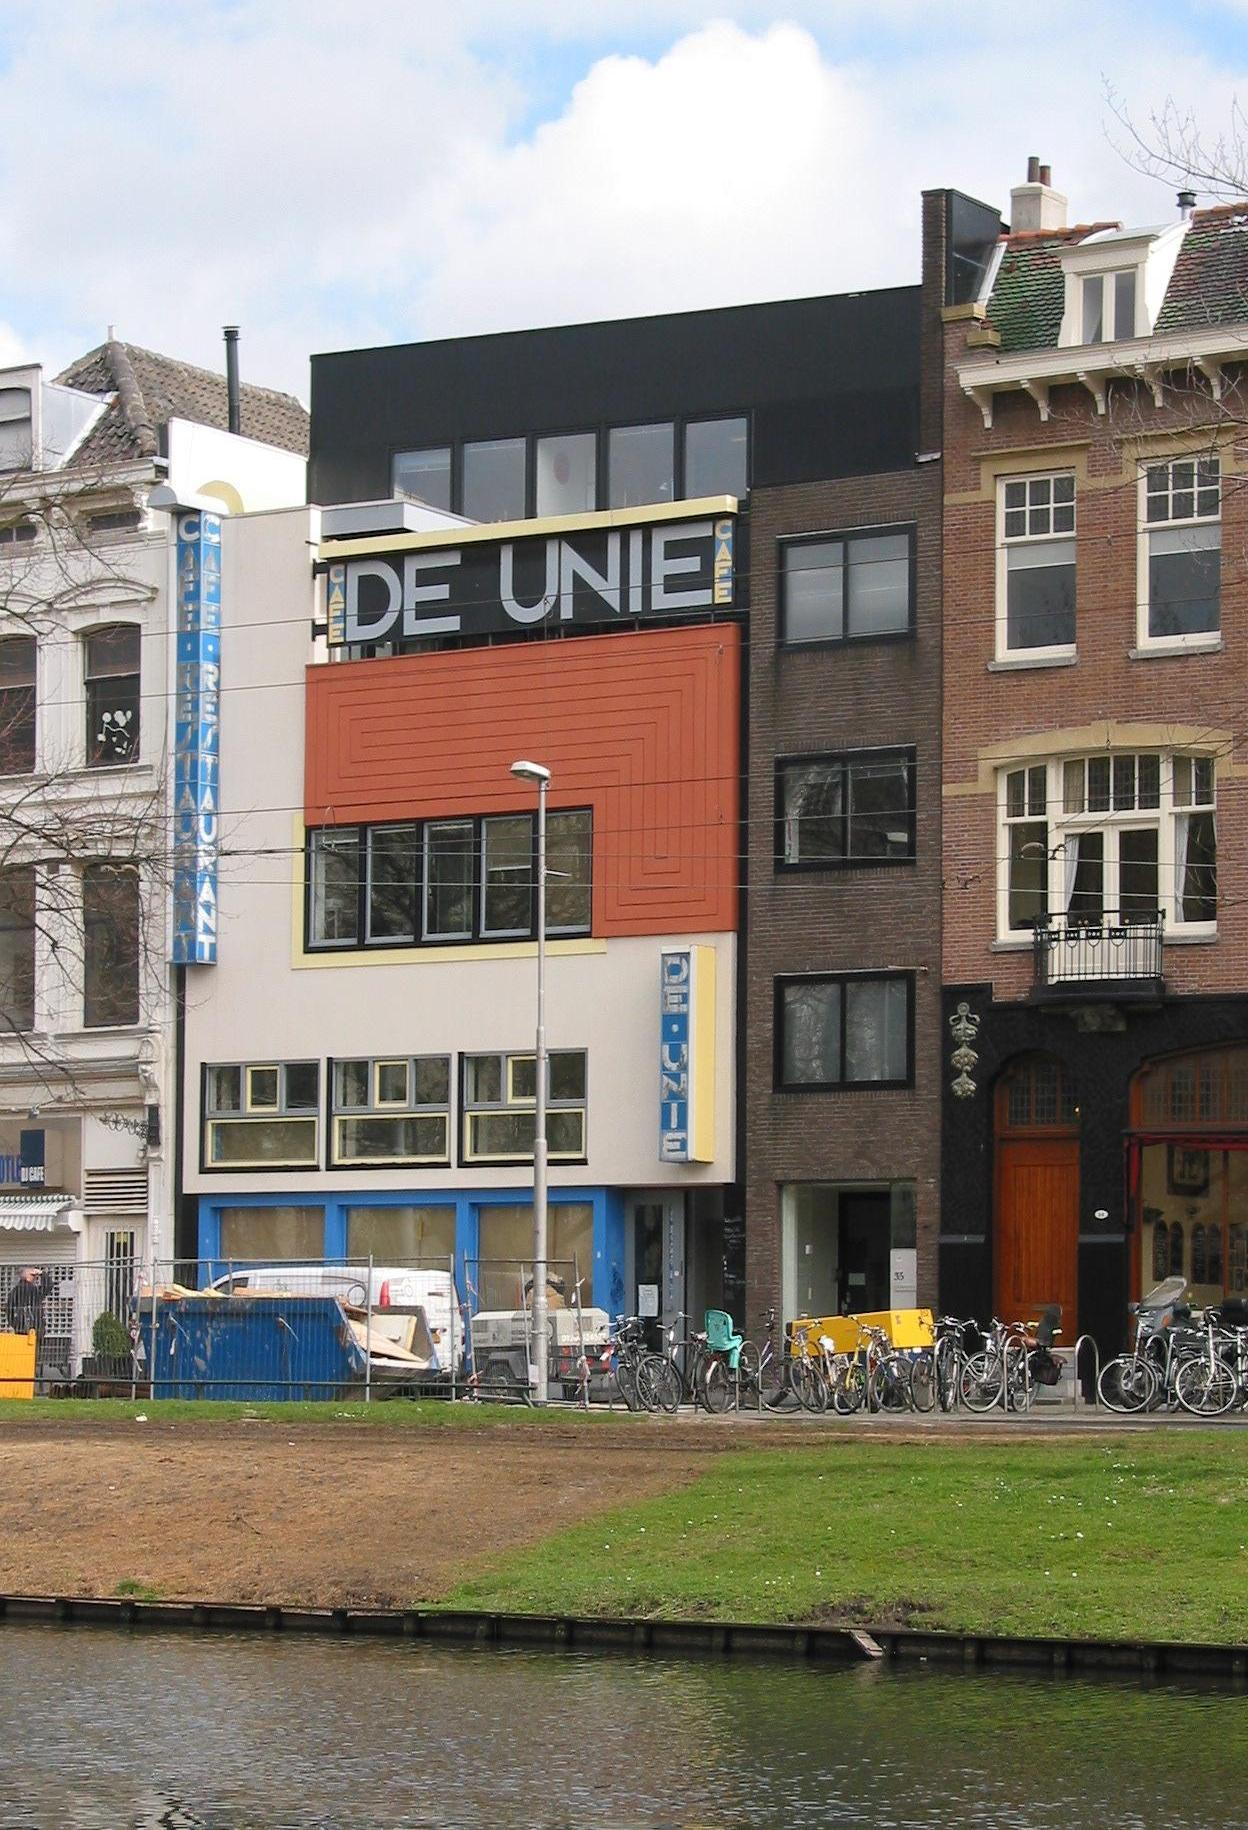 Geliefde File:Café De Unie Mauritsweg Rotterdam.jpg - Wikimedia Commons #BY25